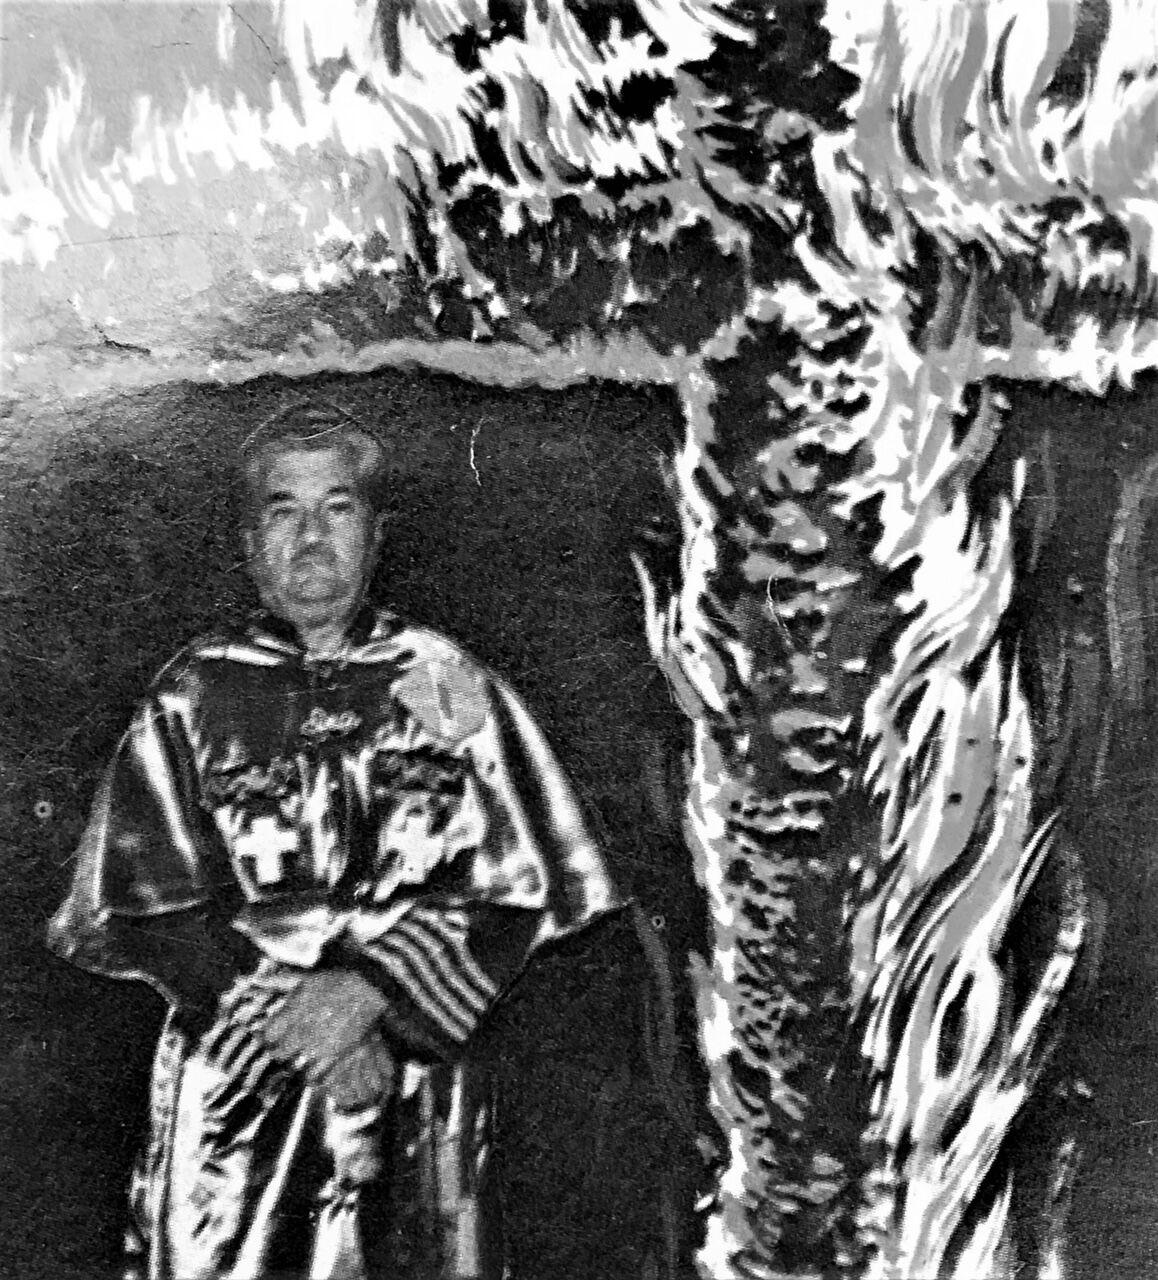 07FULLER Photo1 Fuller in Klan regalia.jpg